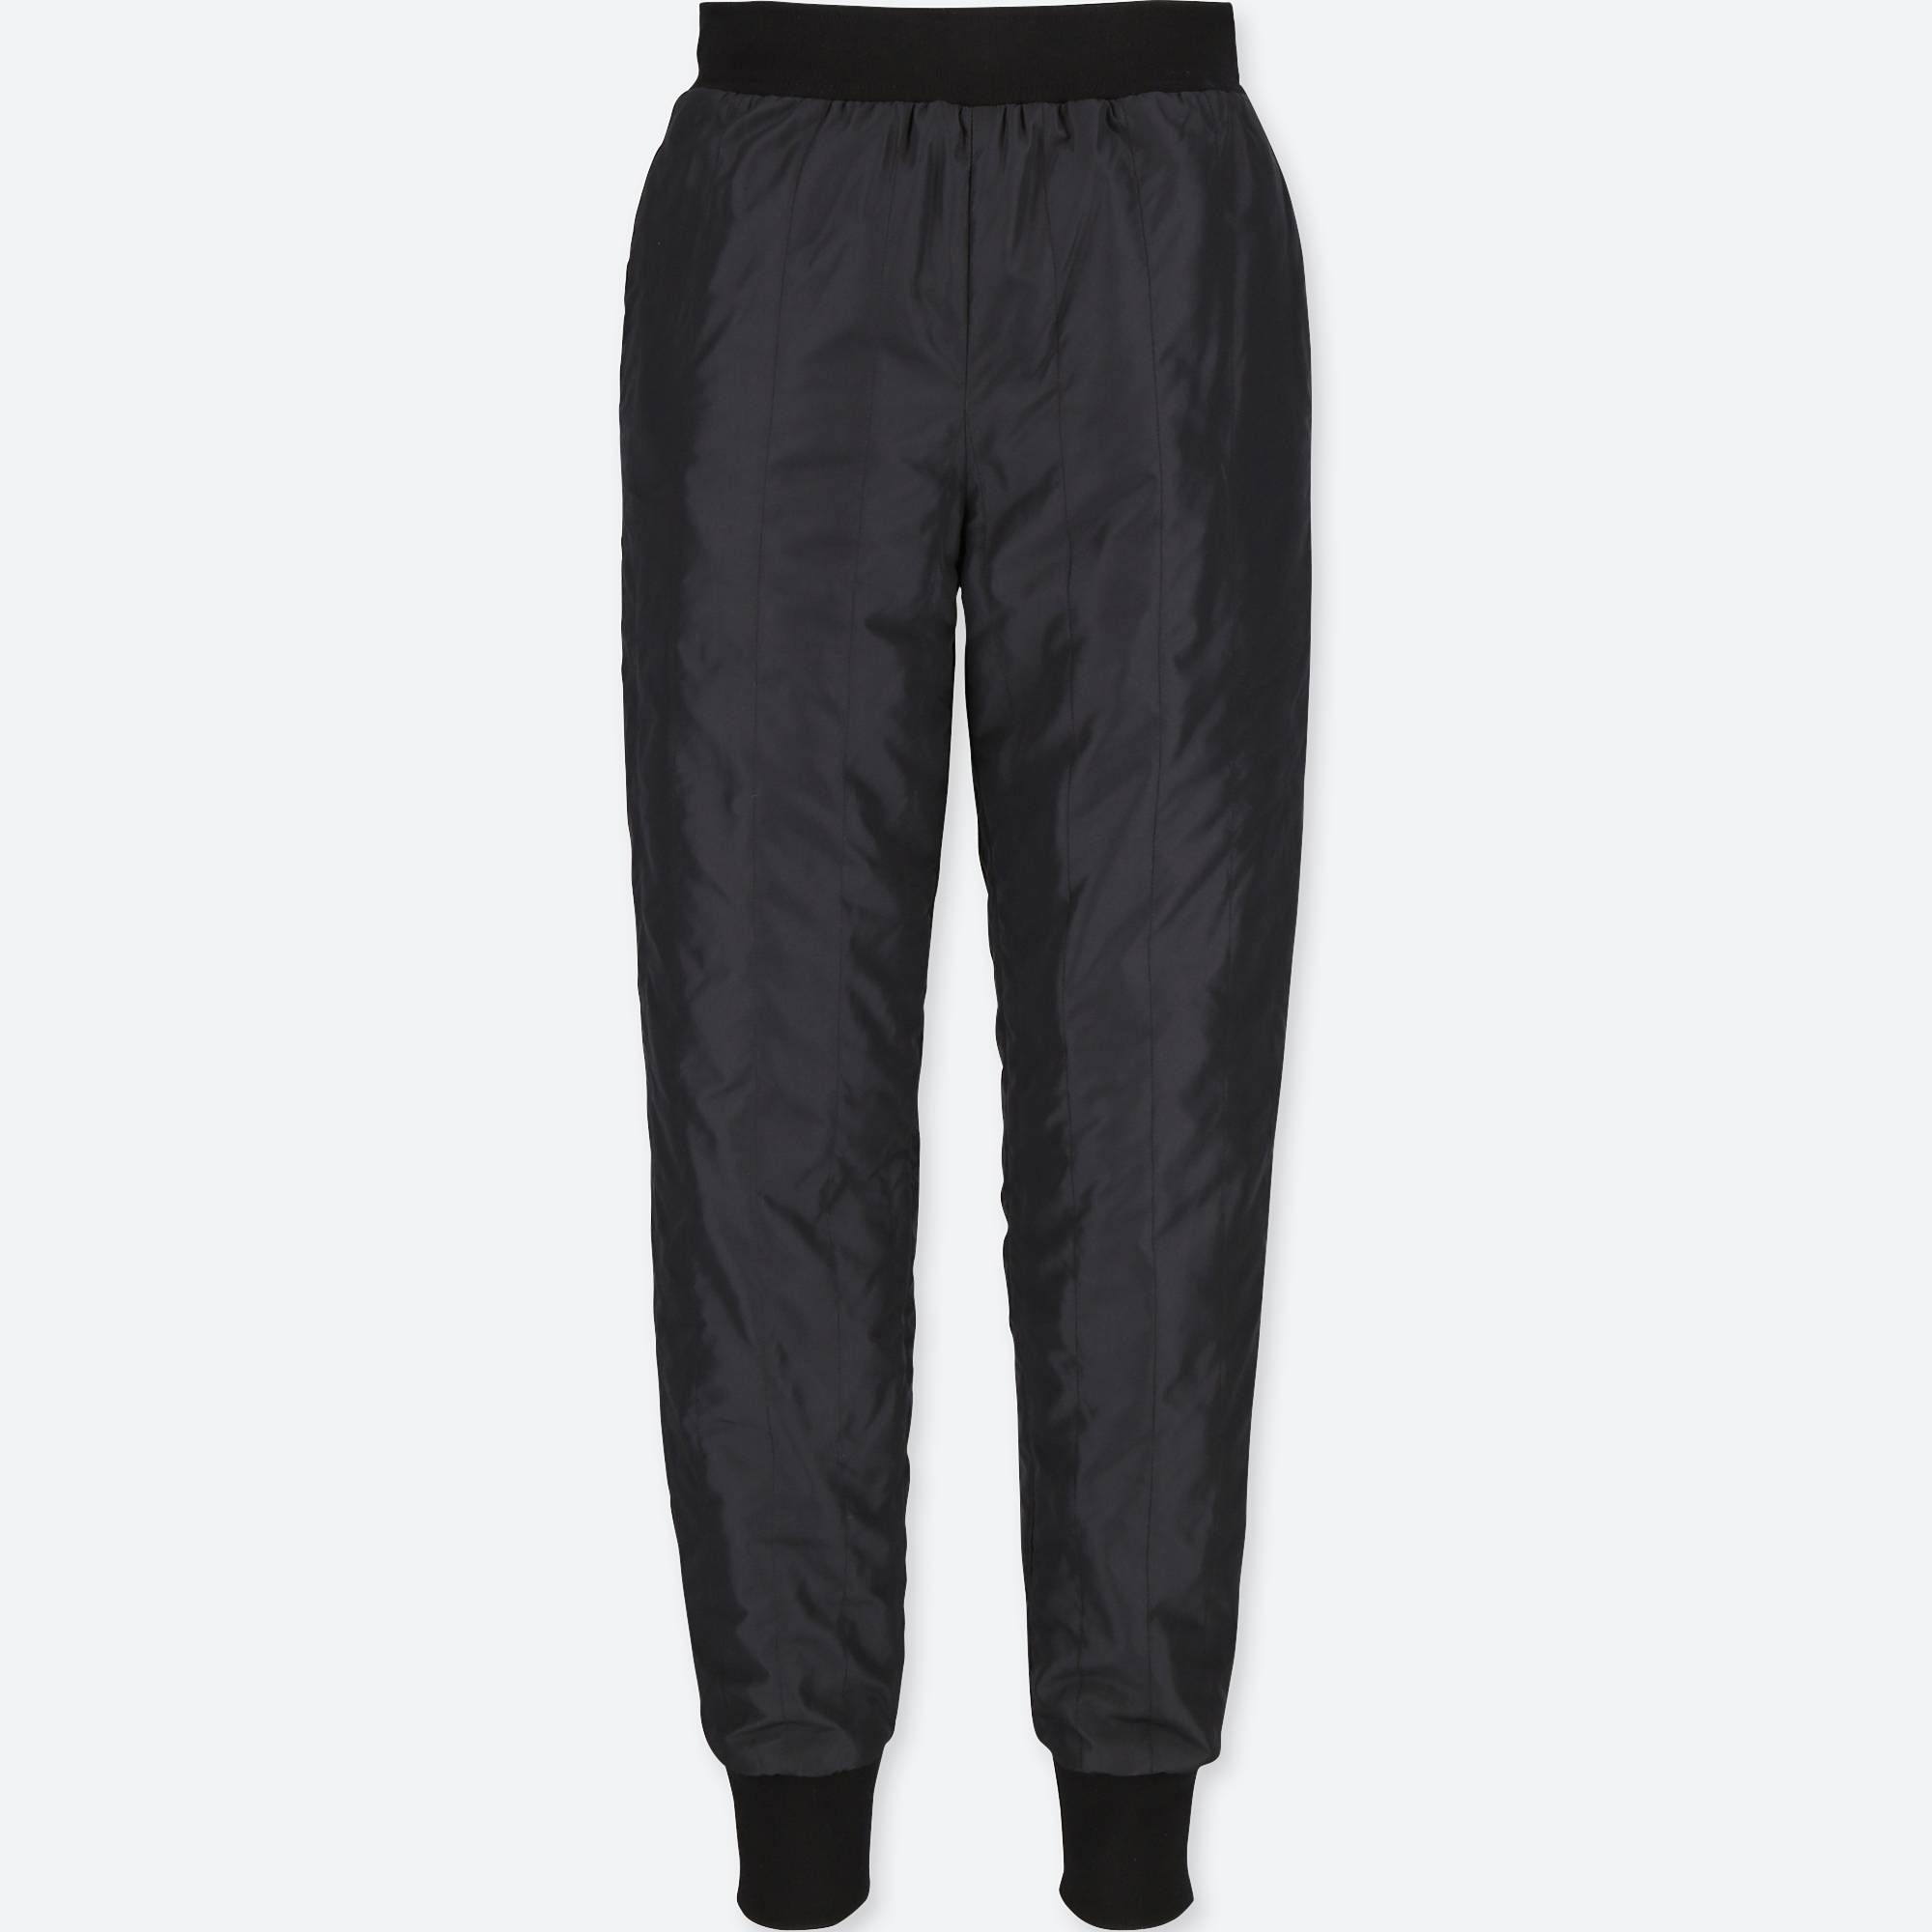 Black Pocketshirt Bobbydaleearnhardt.com